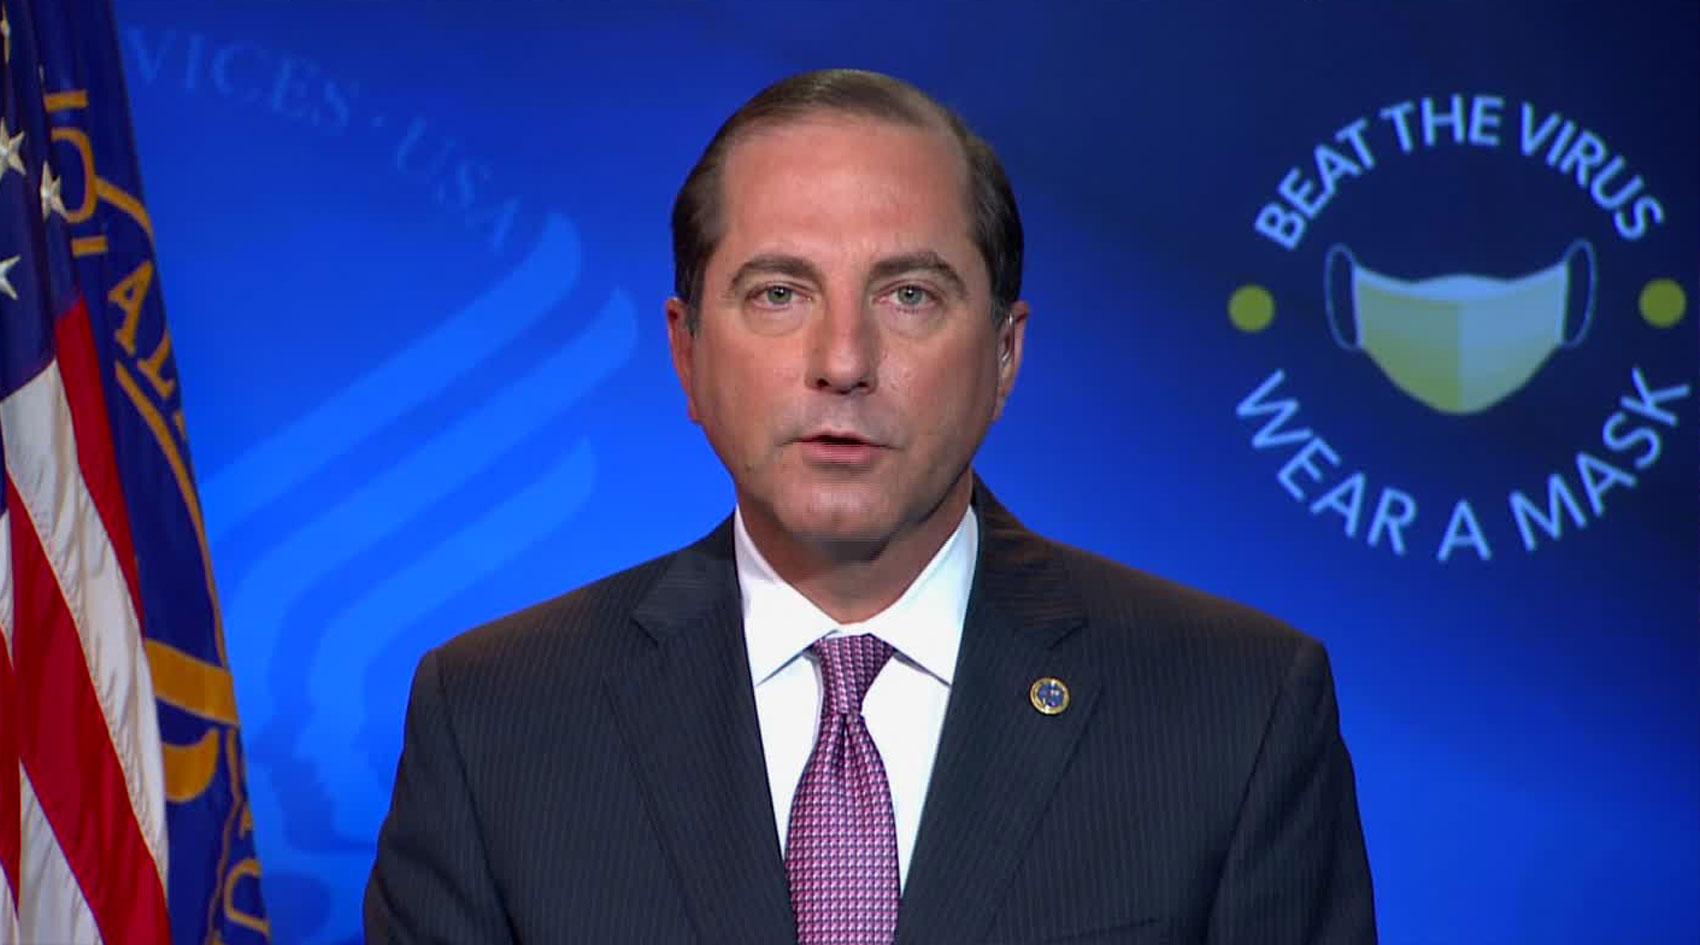 Alex Azar, US Health and Human Services secretary, on December 9.